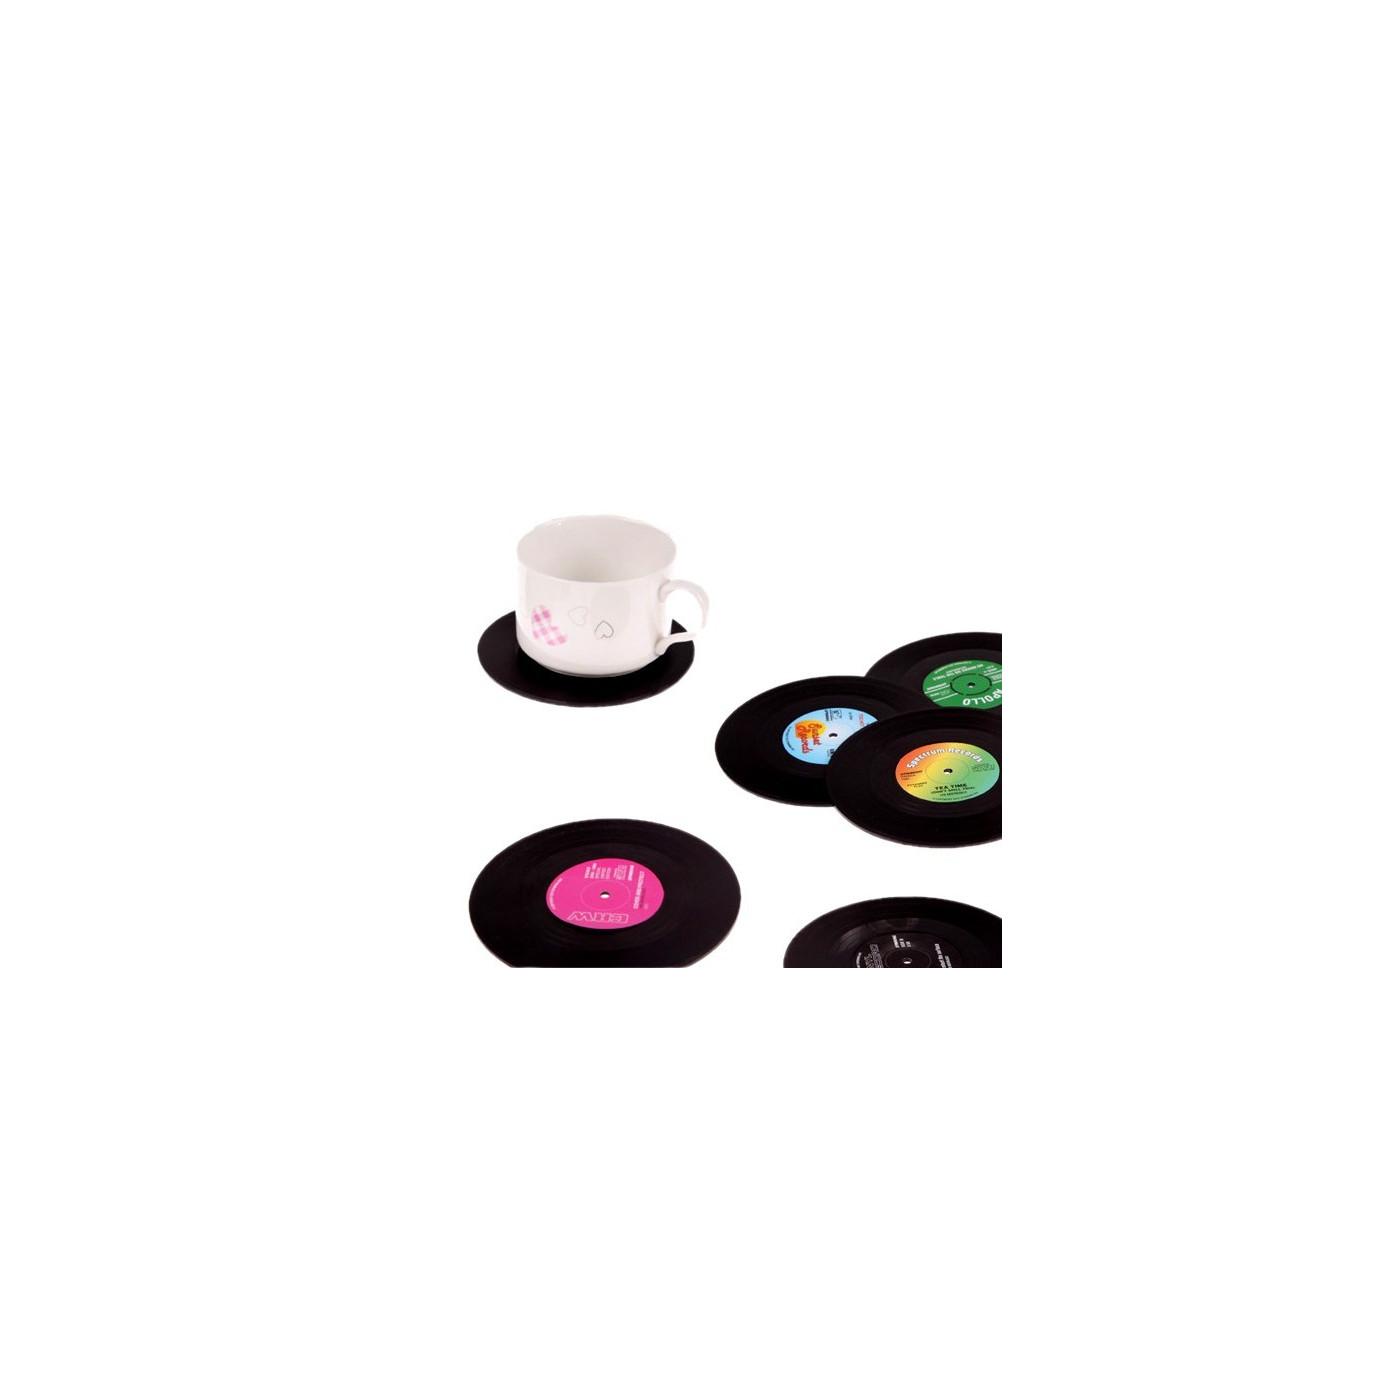 Set van 18 retro vinyl elpee onderzetters